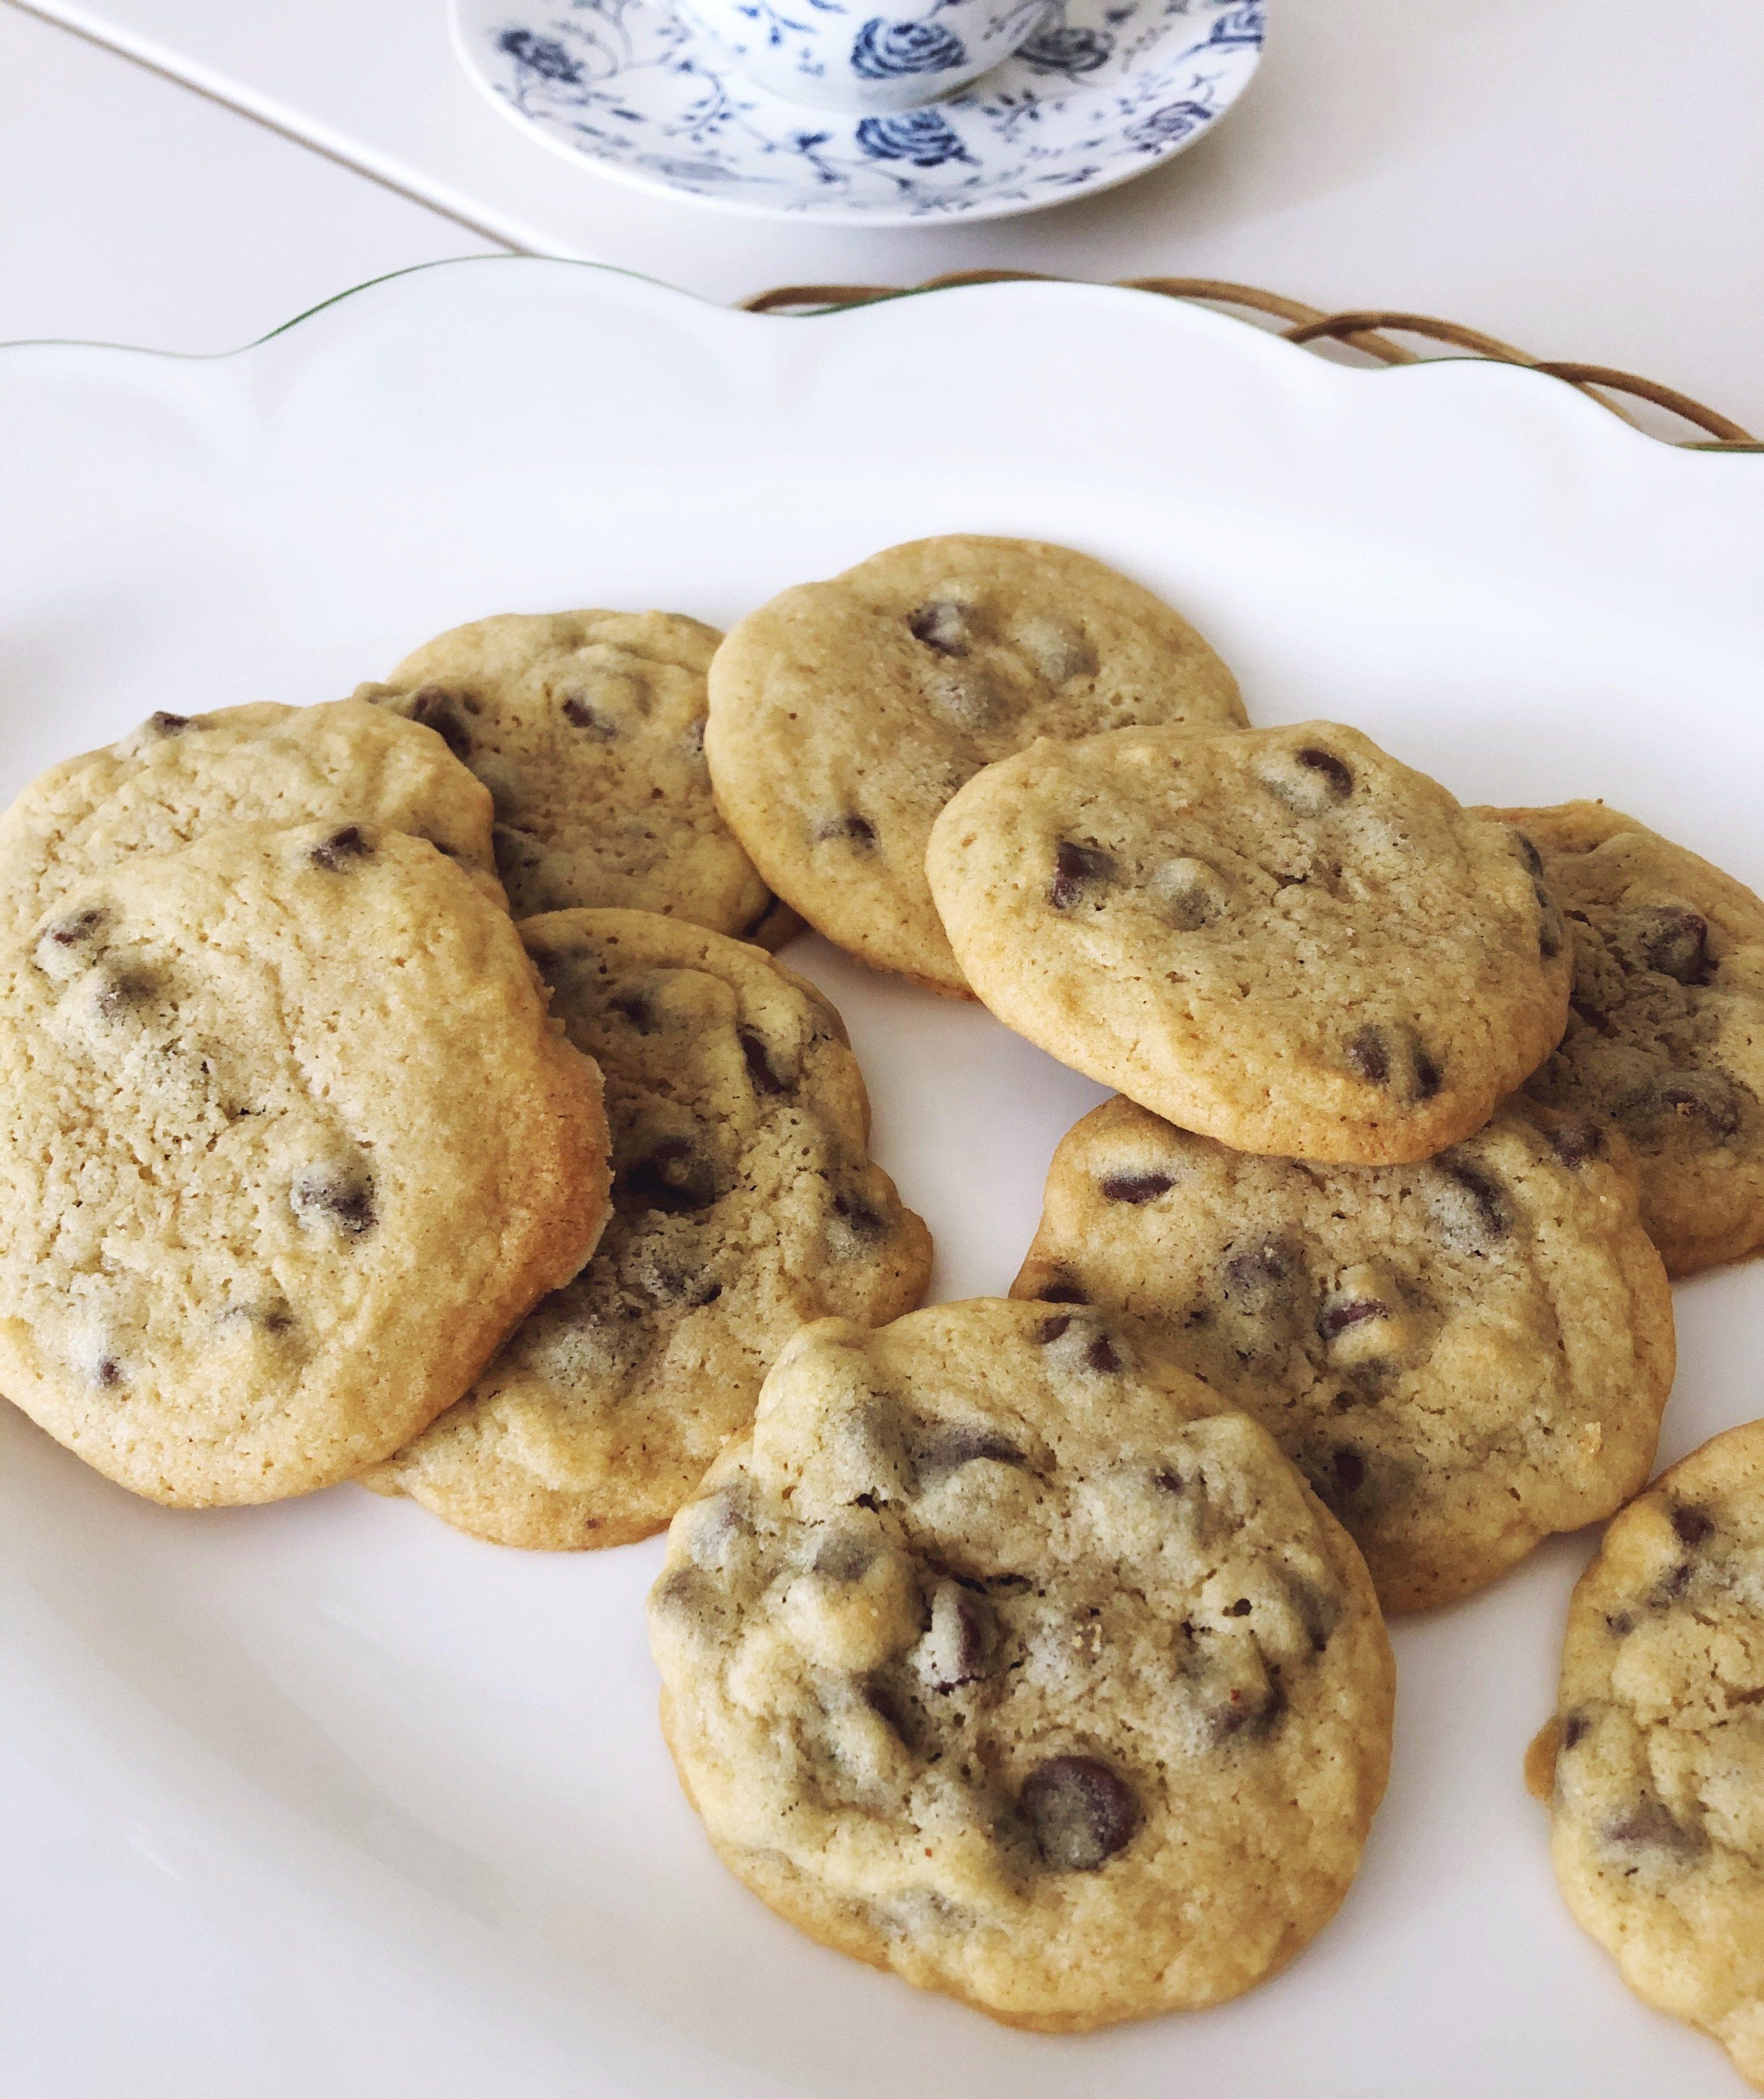 Ghirardelli Chocolate Chip Cookie Recipe Beautifully Seaside